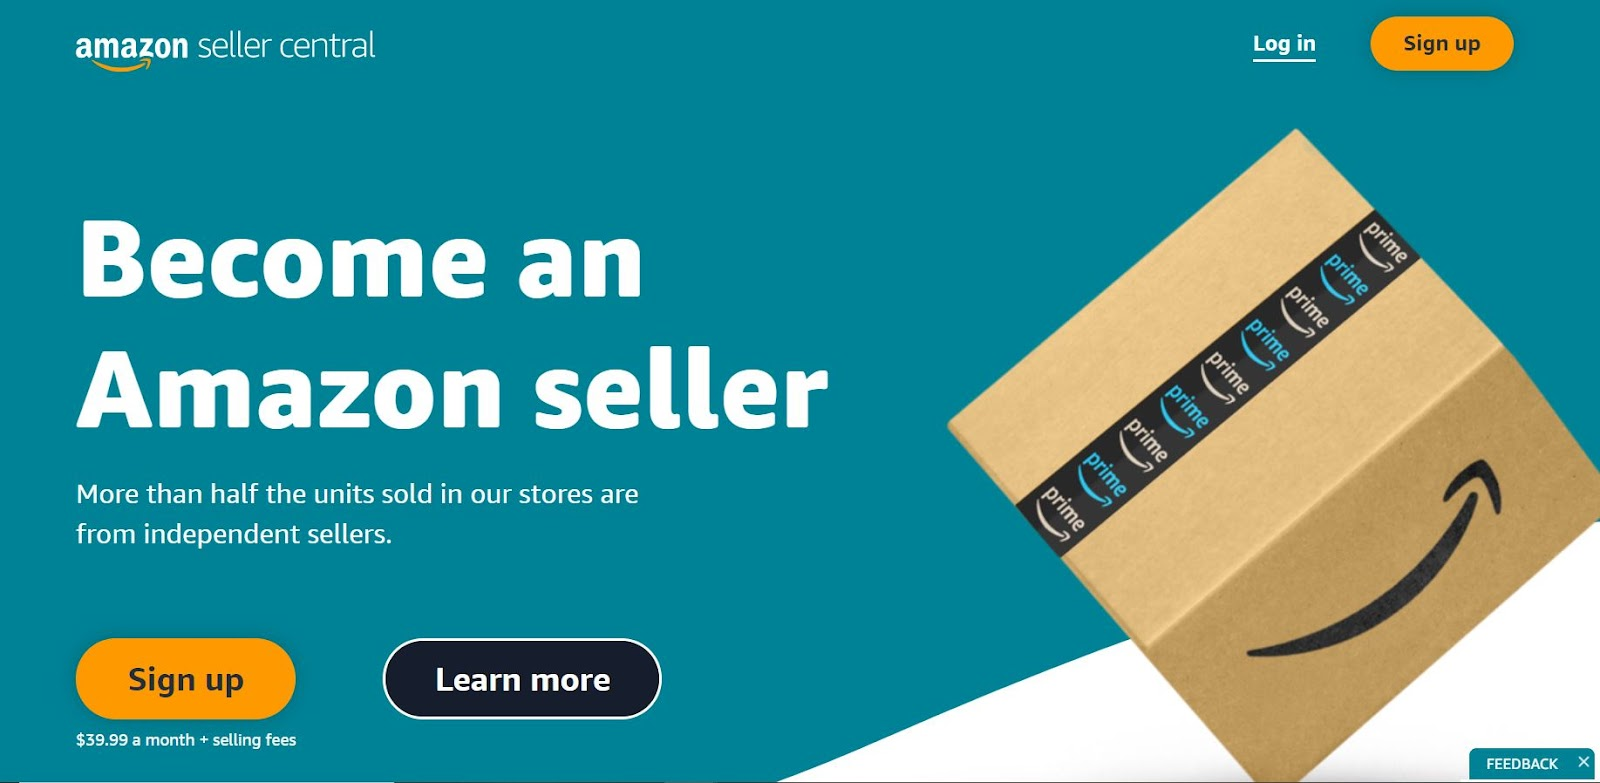 Amazon seller site